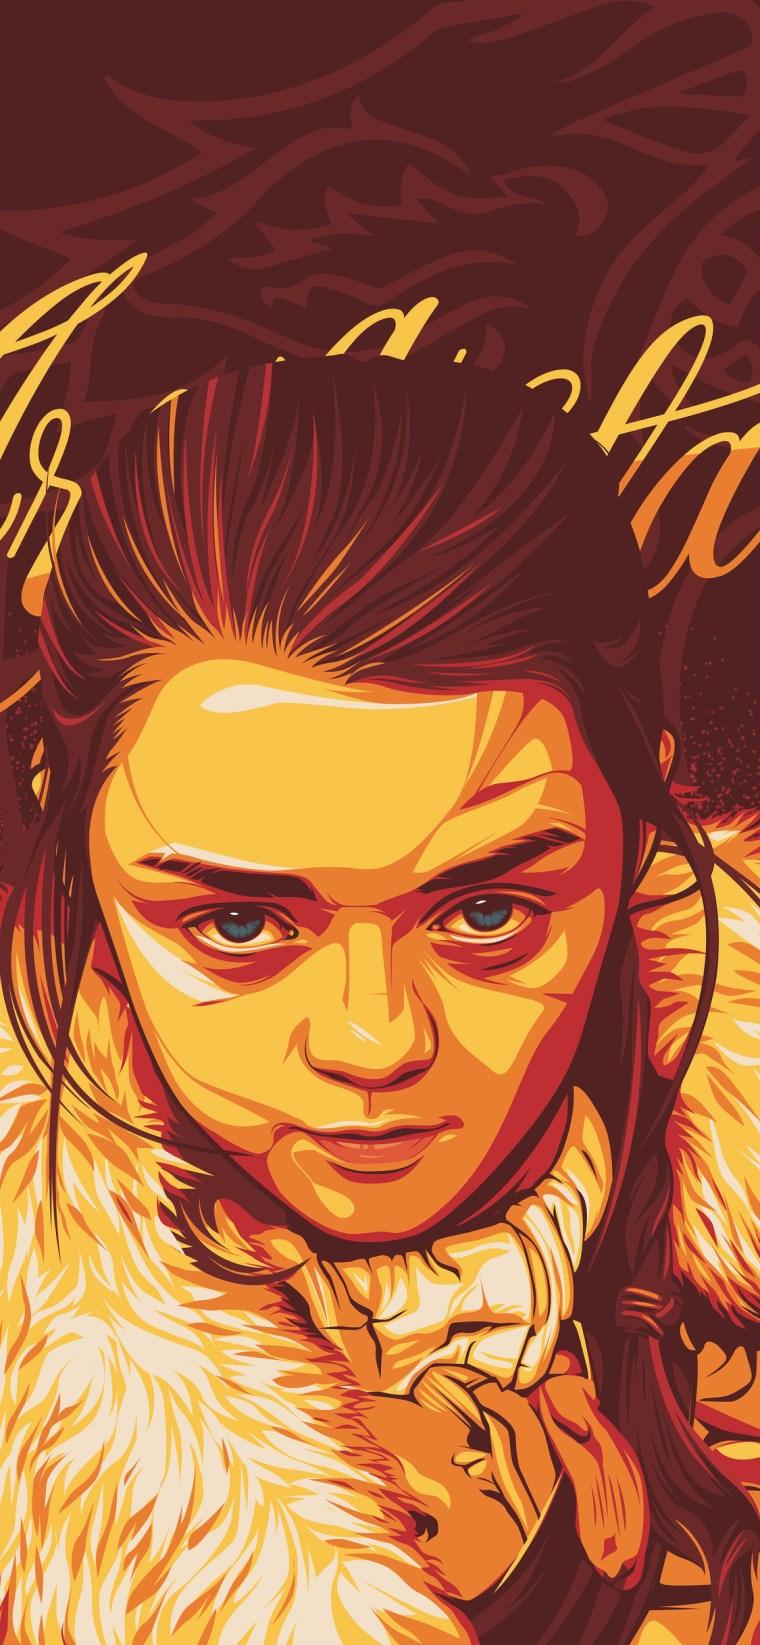 arya-stark-digital-art-z7-1125x2436 iPhone game of thrones wallpaper